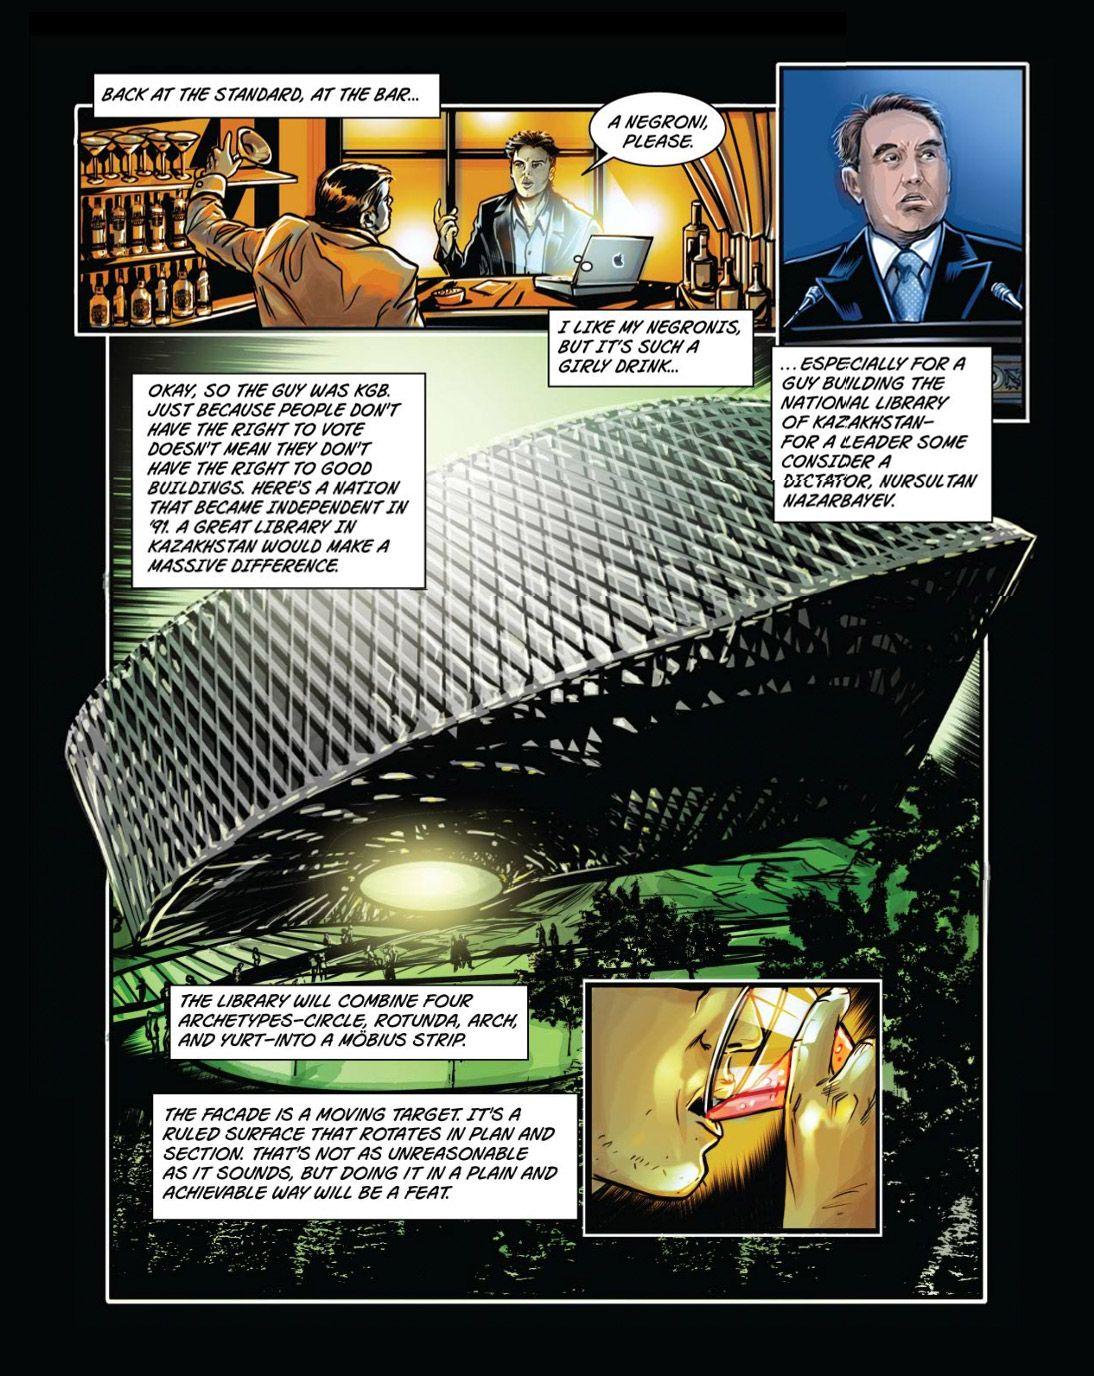 e n arkitektur Bjarke Ingels er en tegneseriefigur   RASMUS BRØNNUM – en  e n arkitektur